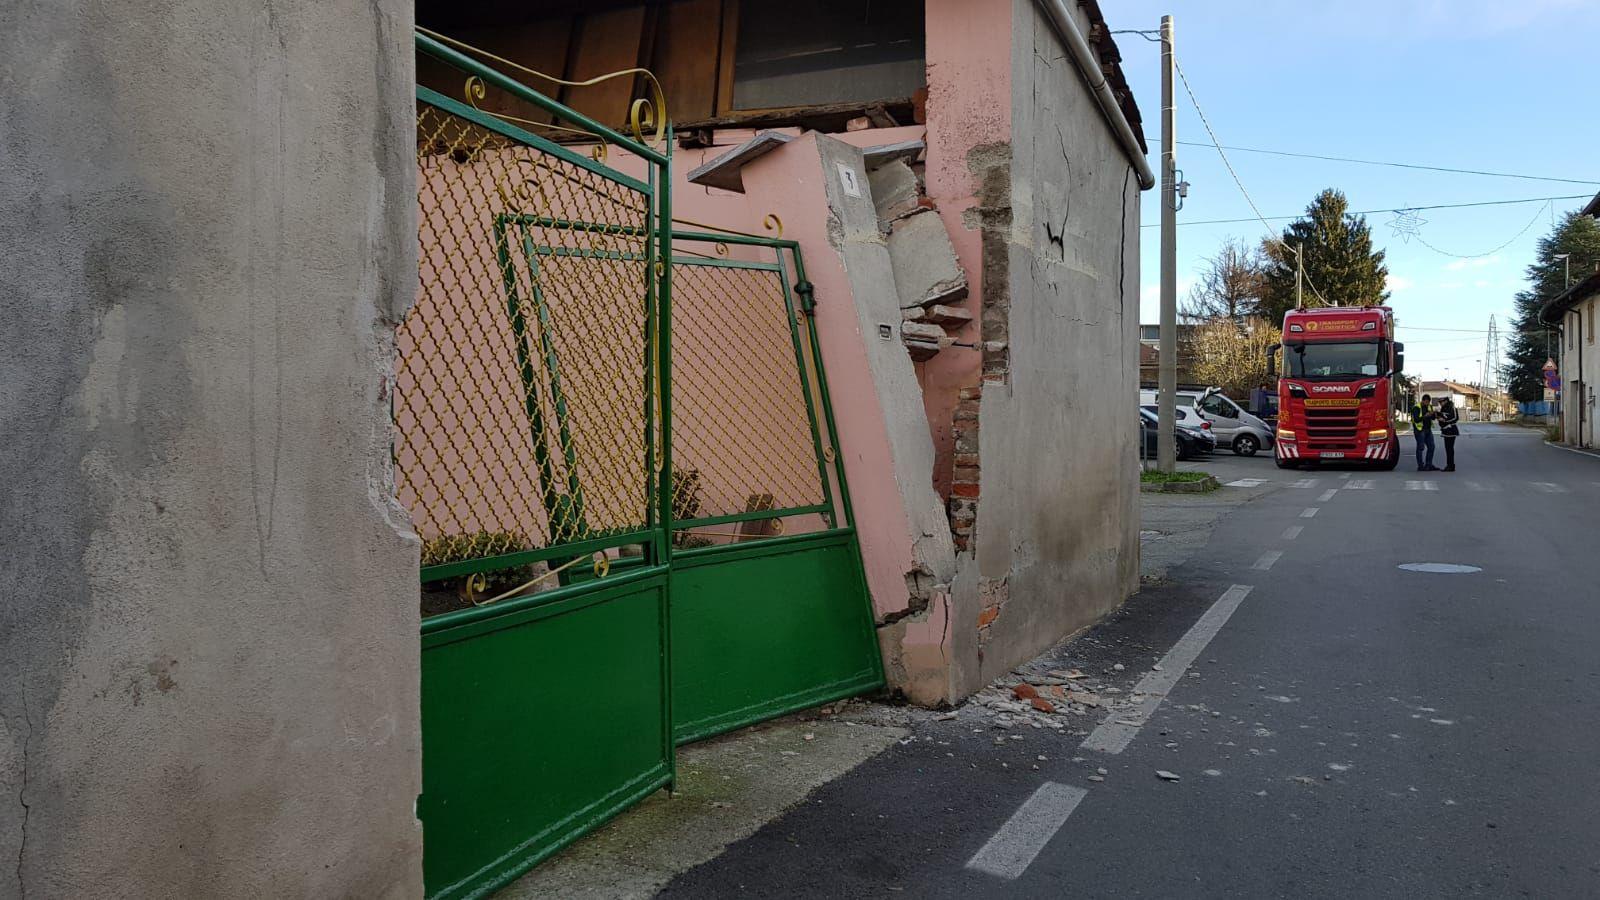 RIVAROLO - Tir abbatte l'ingresso di una casa a Pasquaro - FOTO